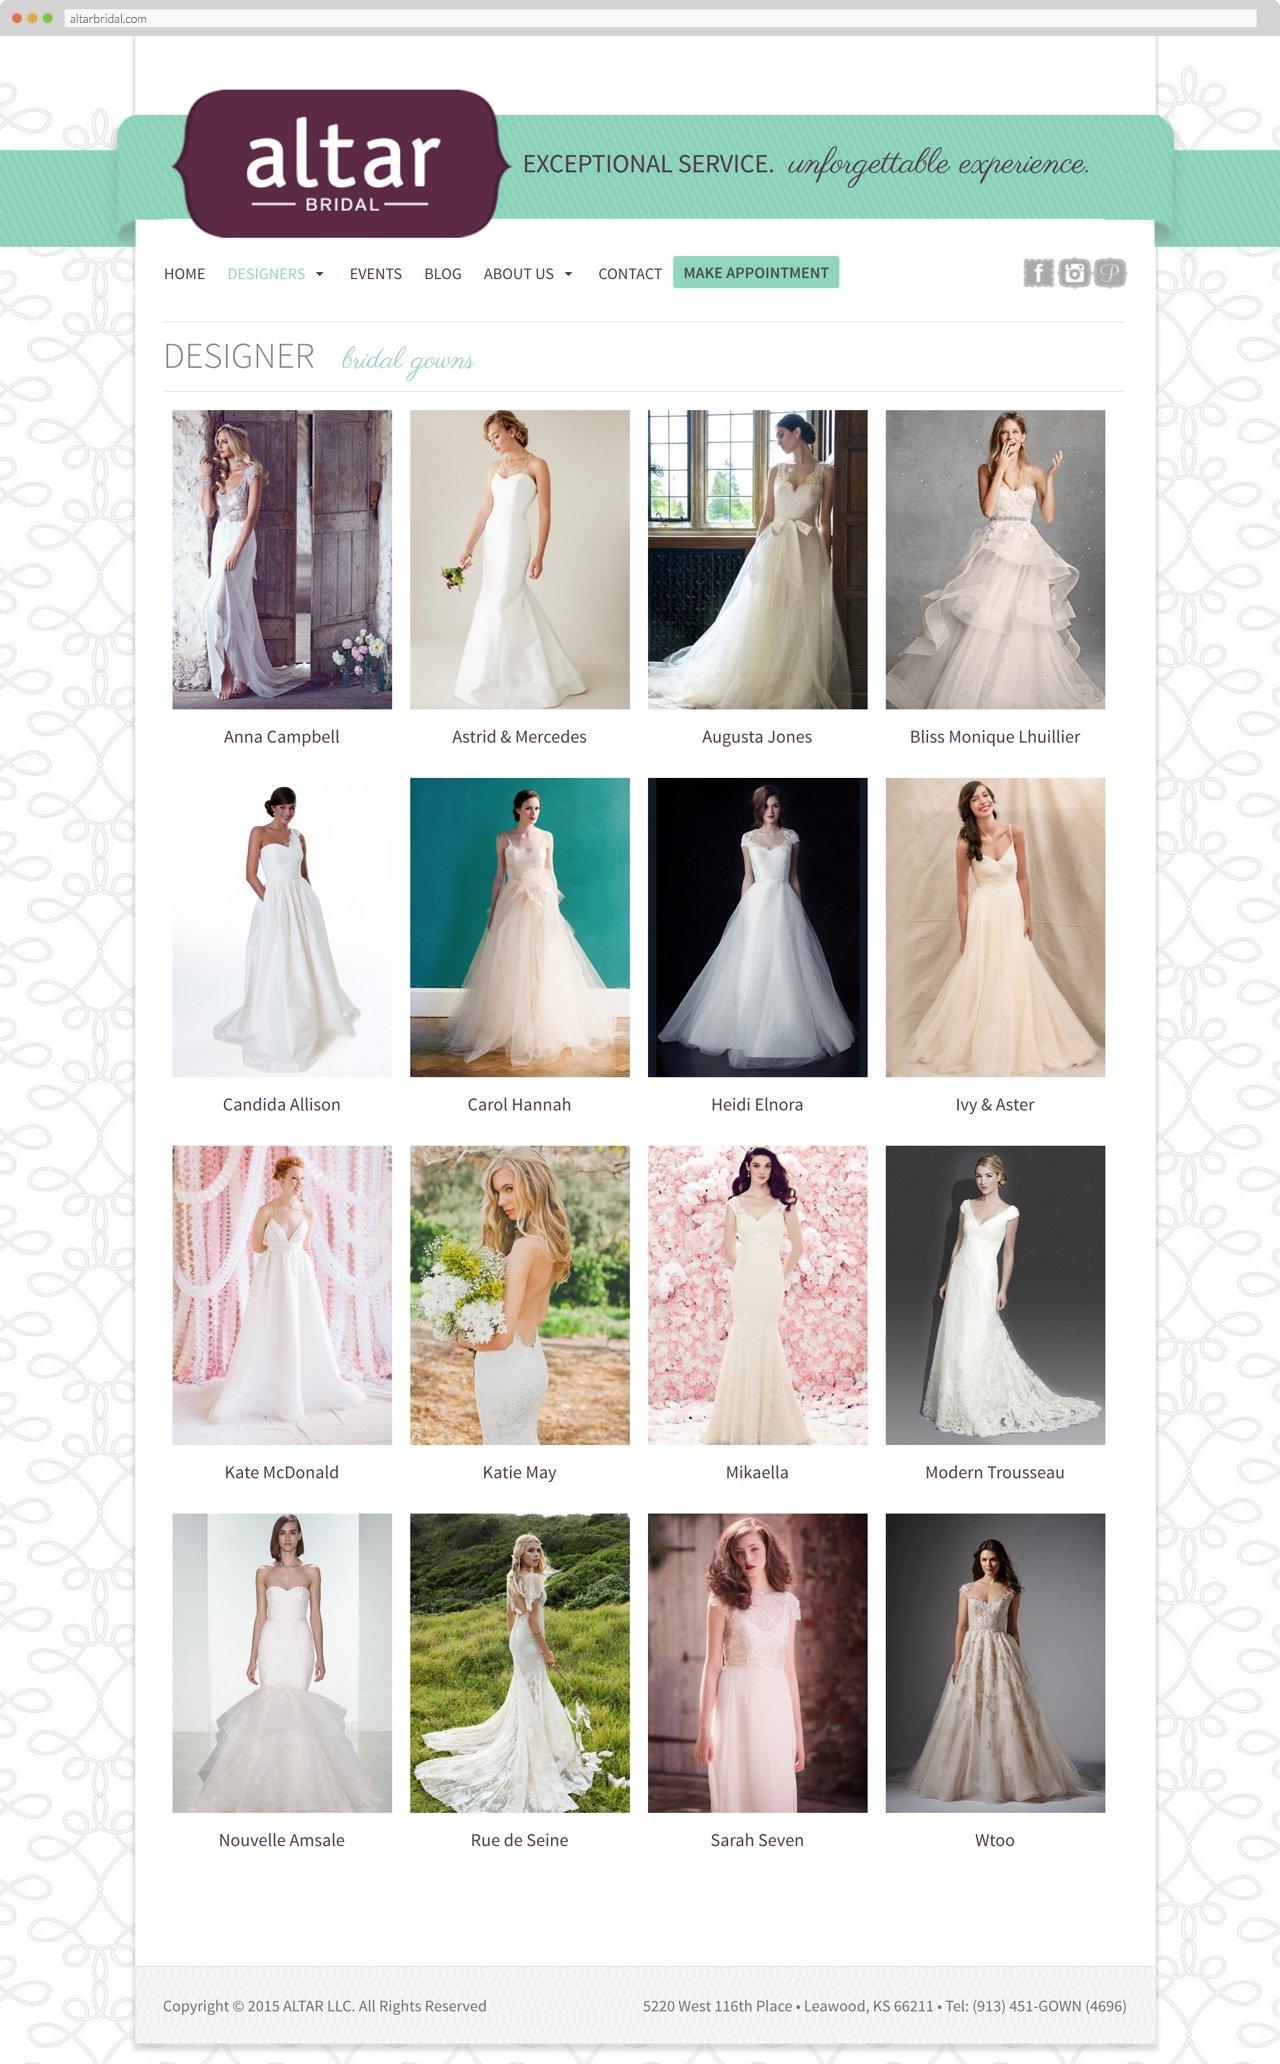 Altar Bridal, designers